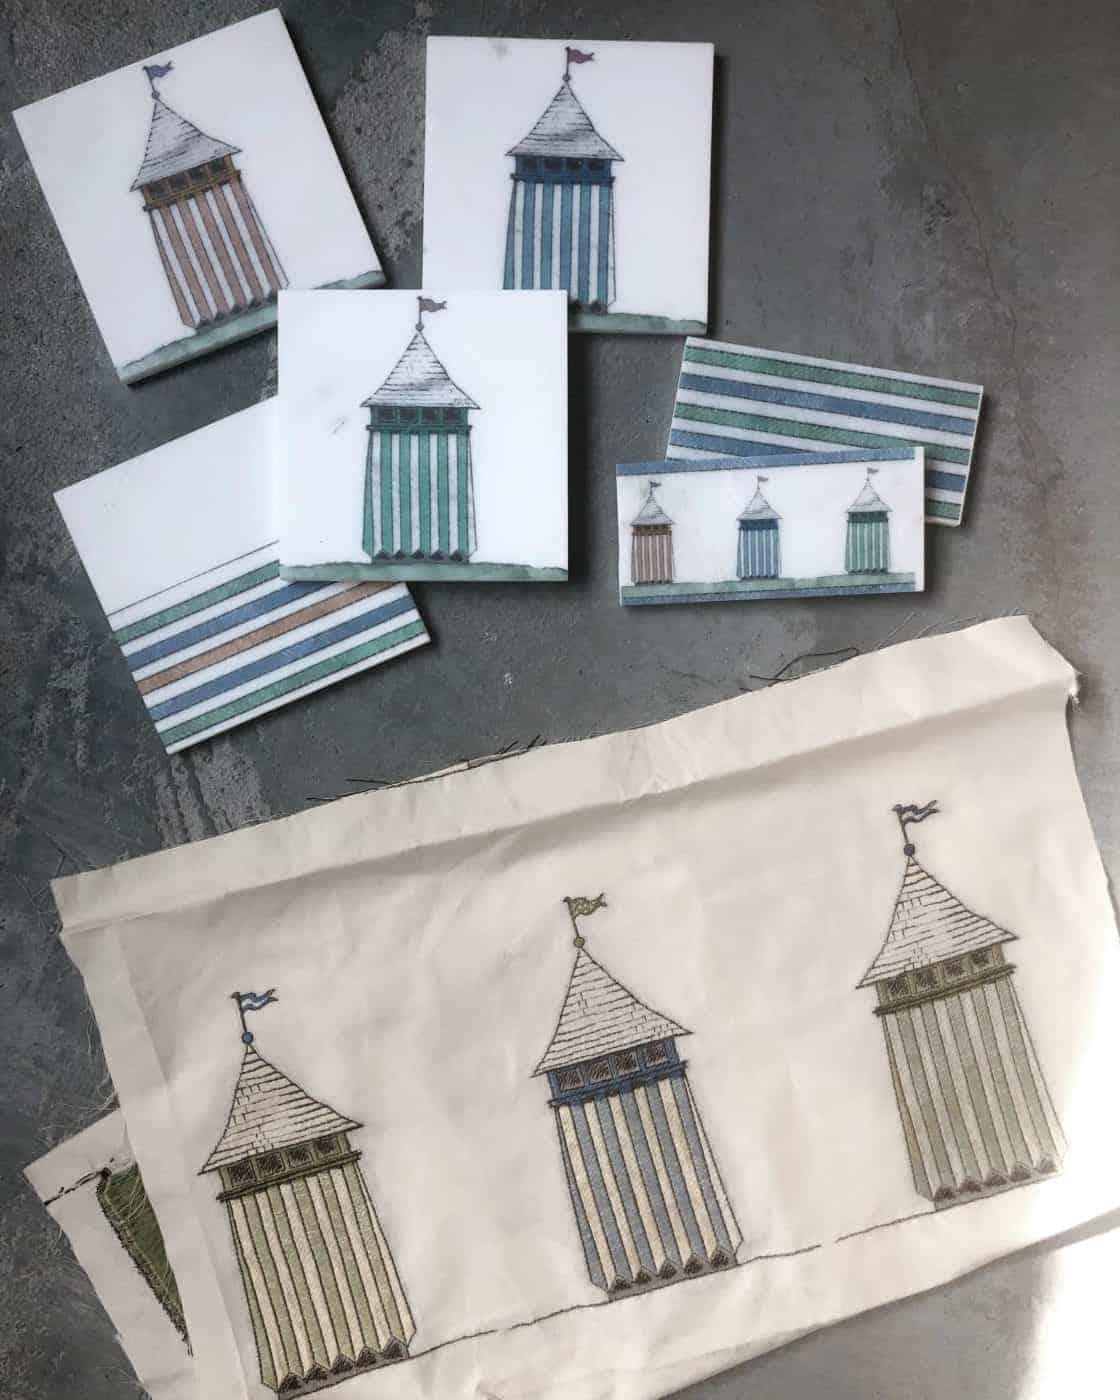 Custom accent tiles of bathhouses for child's bathroom